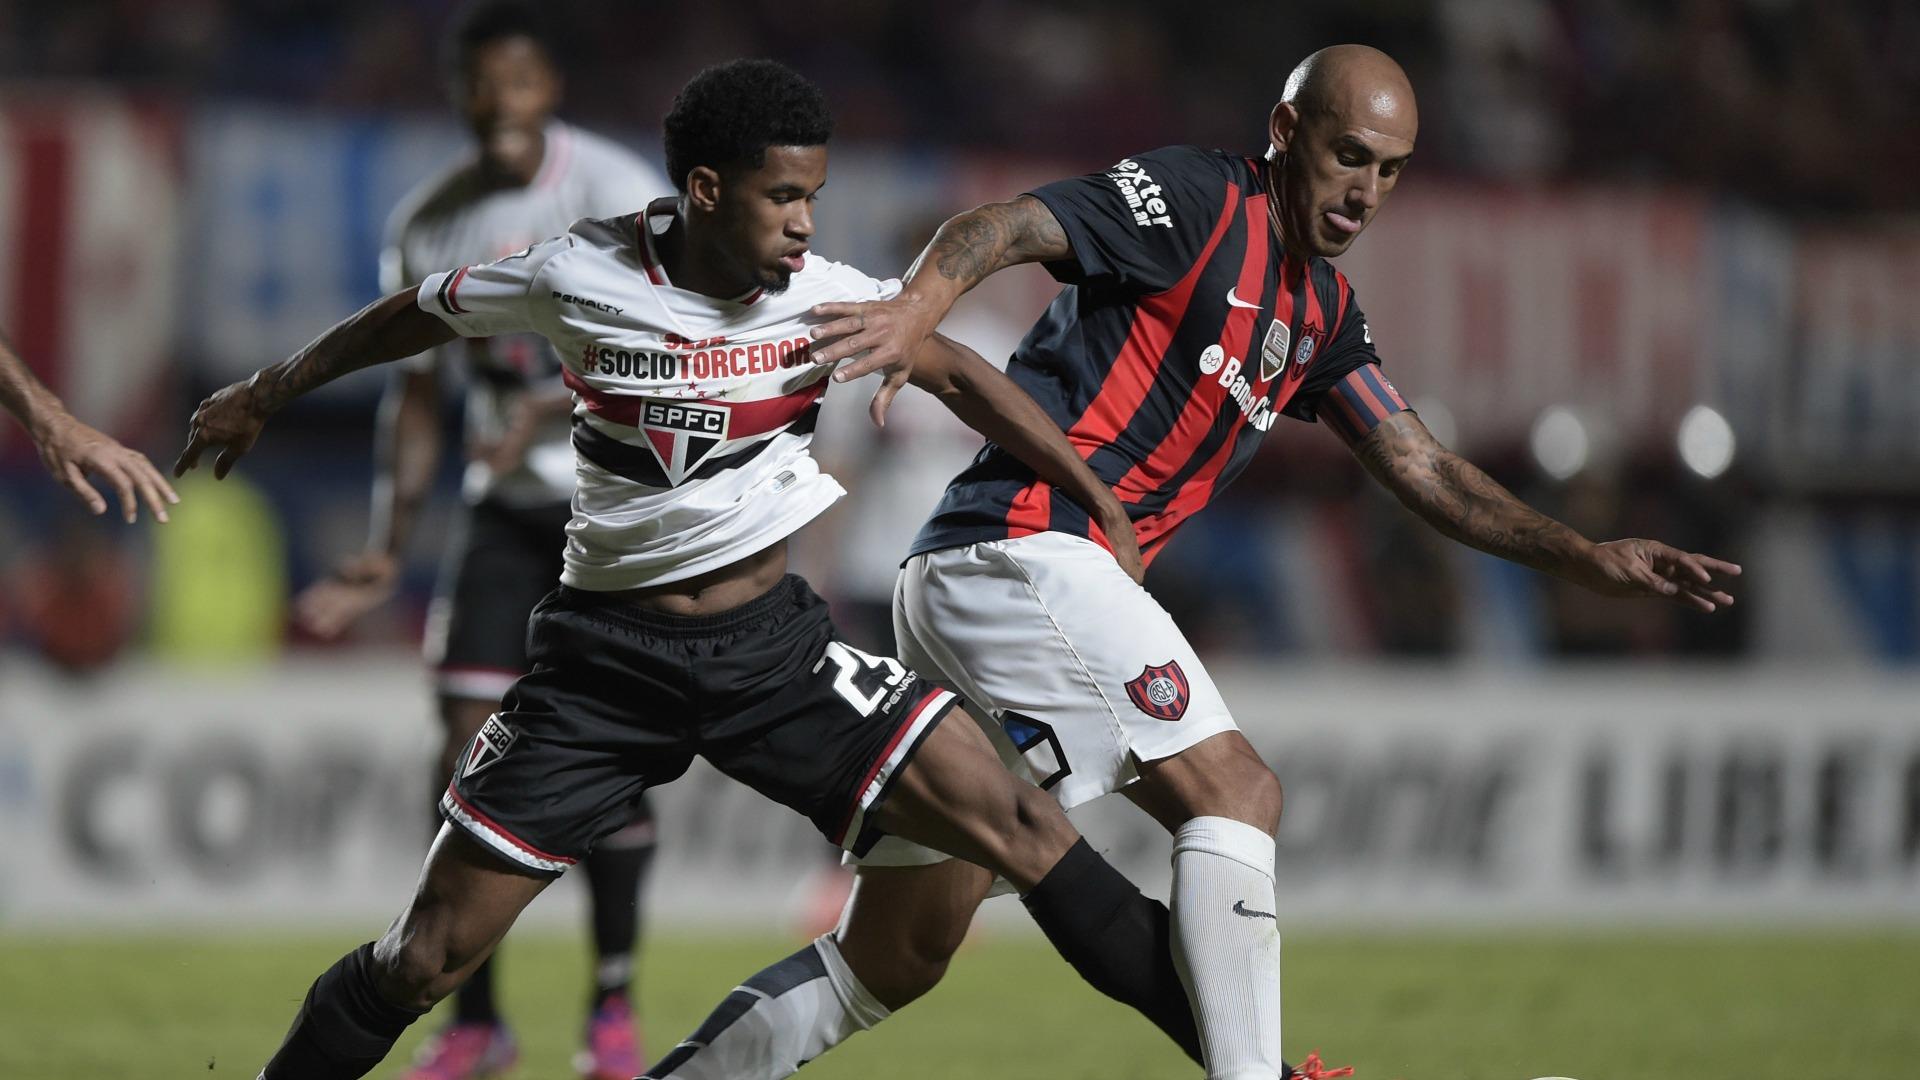 Udinese, UFFICIALE: colpo Ewandro